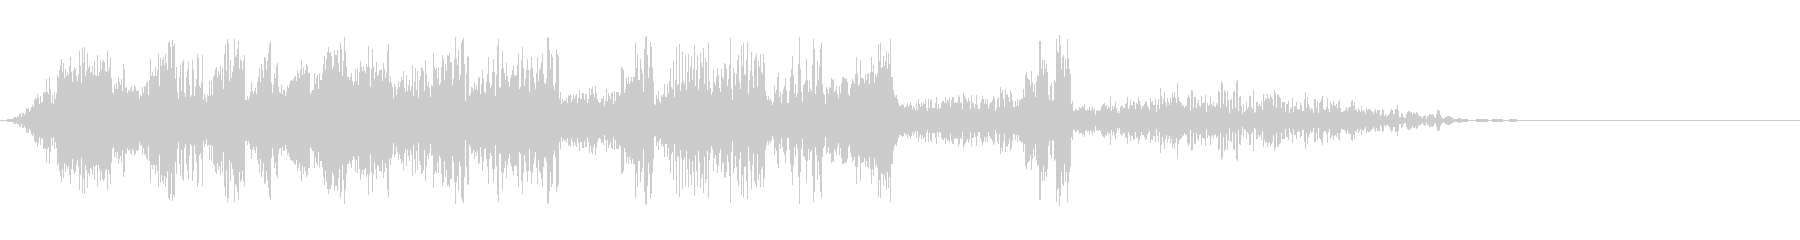 DJスクラッチ01_リバース音01の未再生の波形